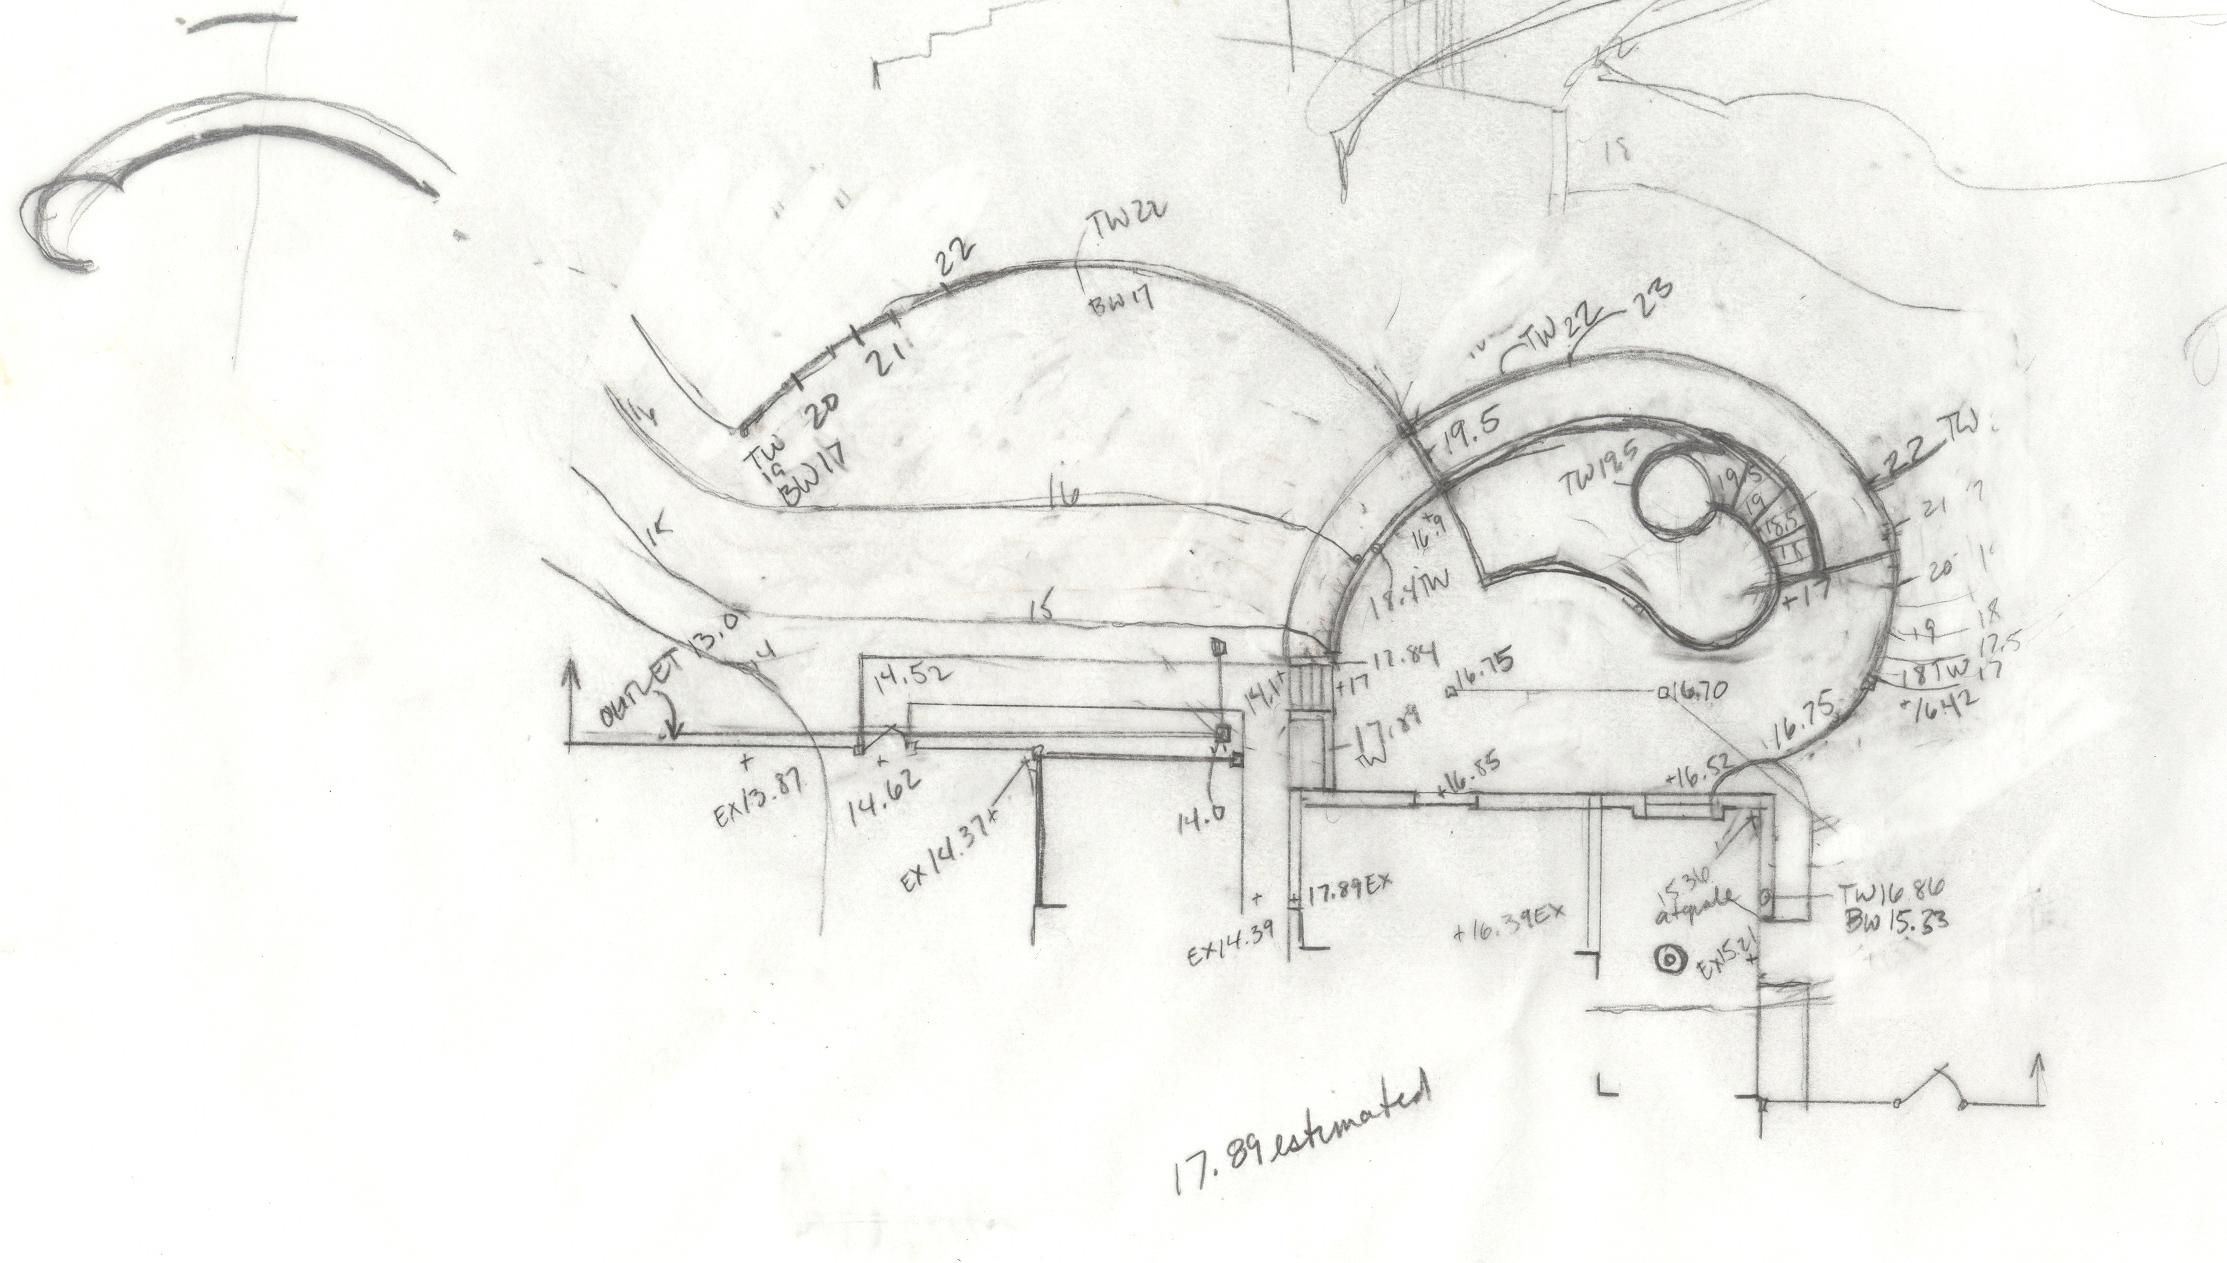 Architecture Design Technical Process design process - las-llc delaware landscape architecture - serving